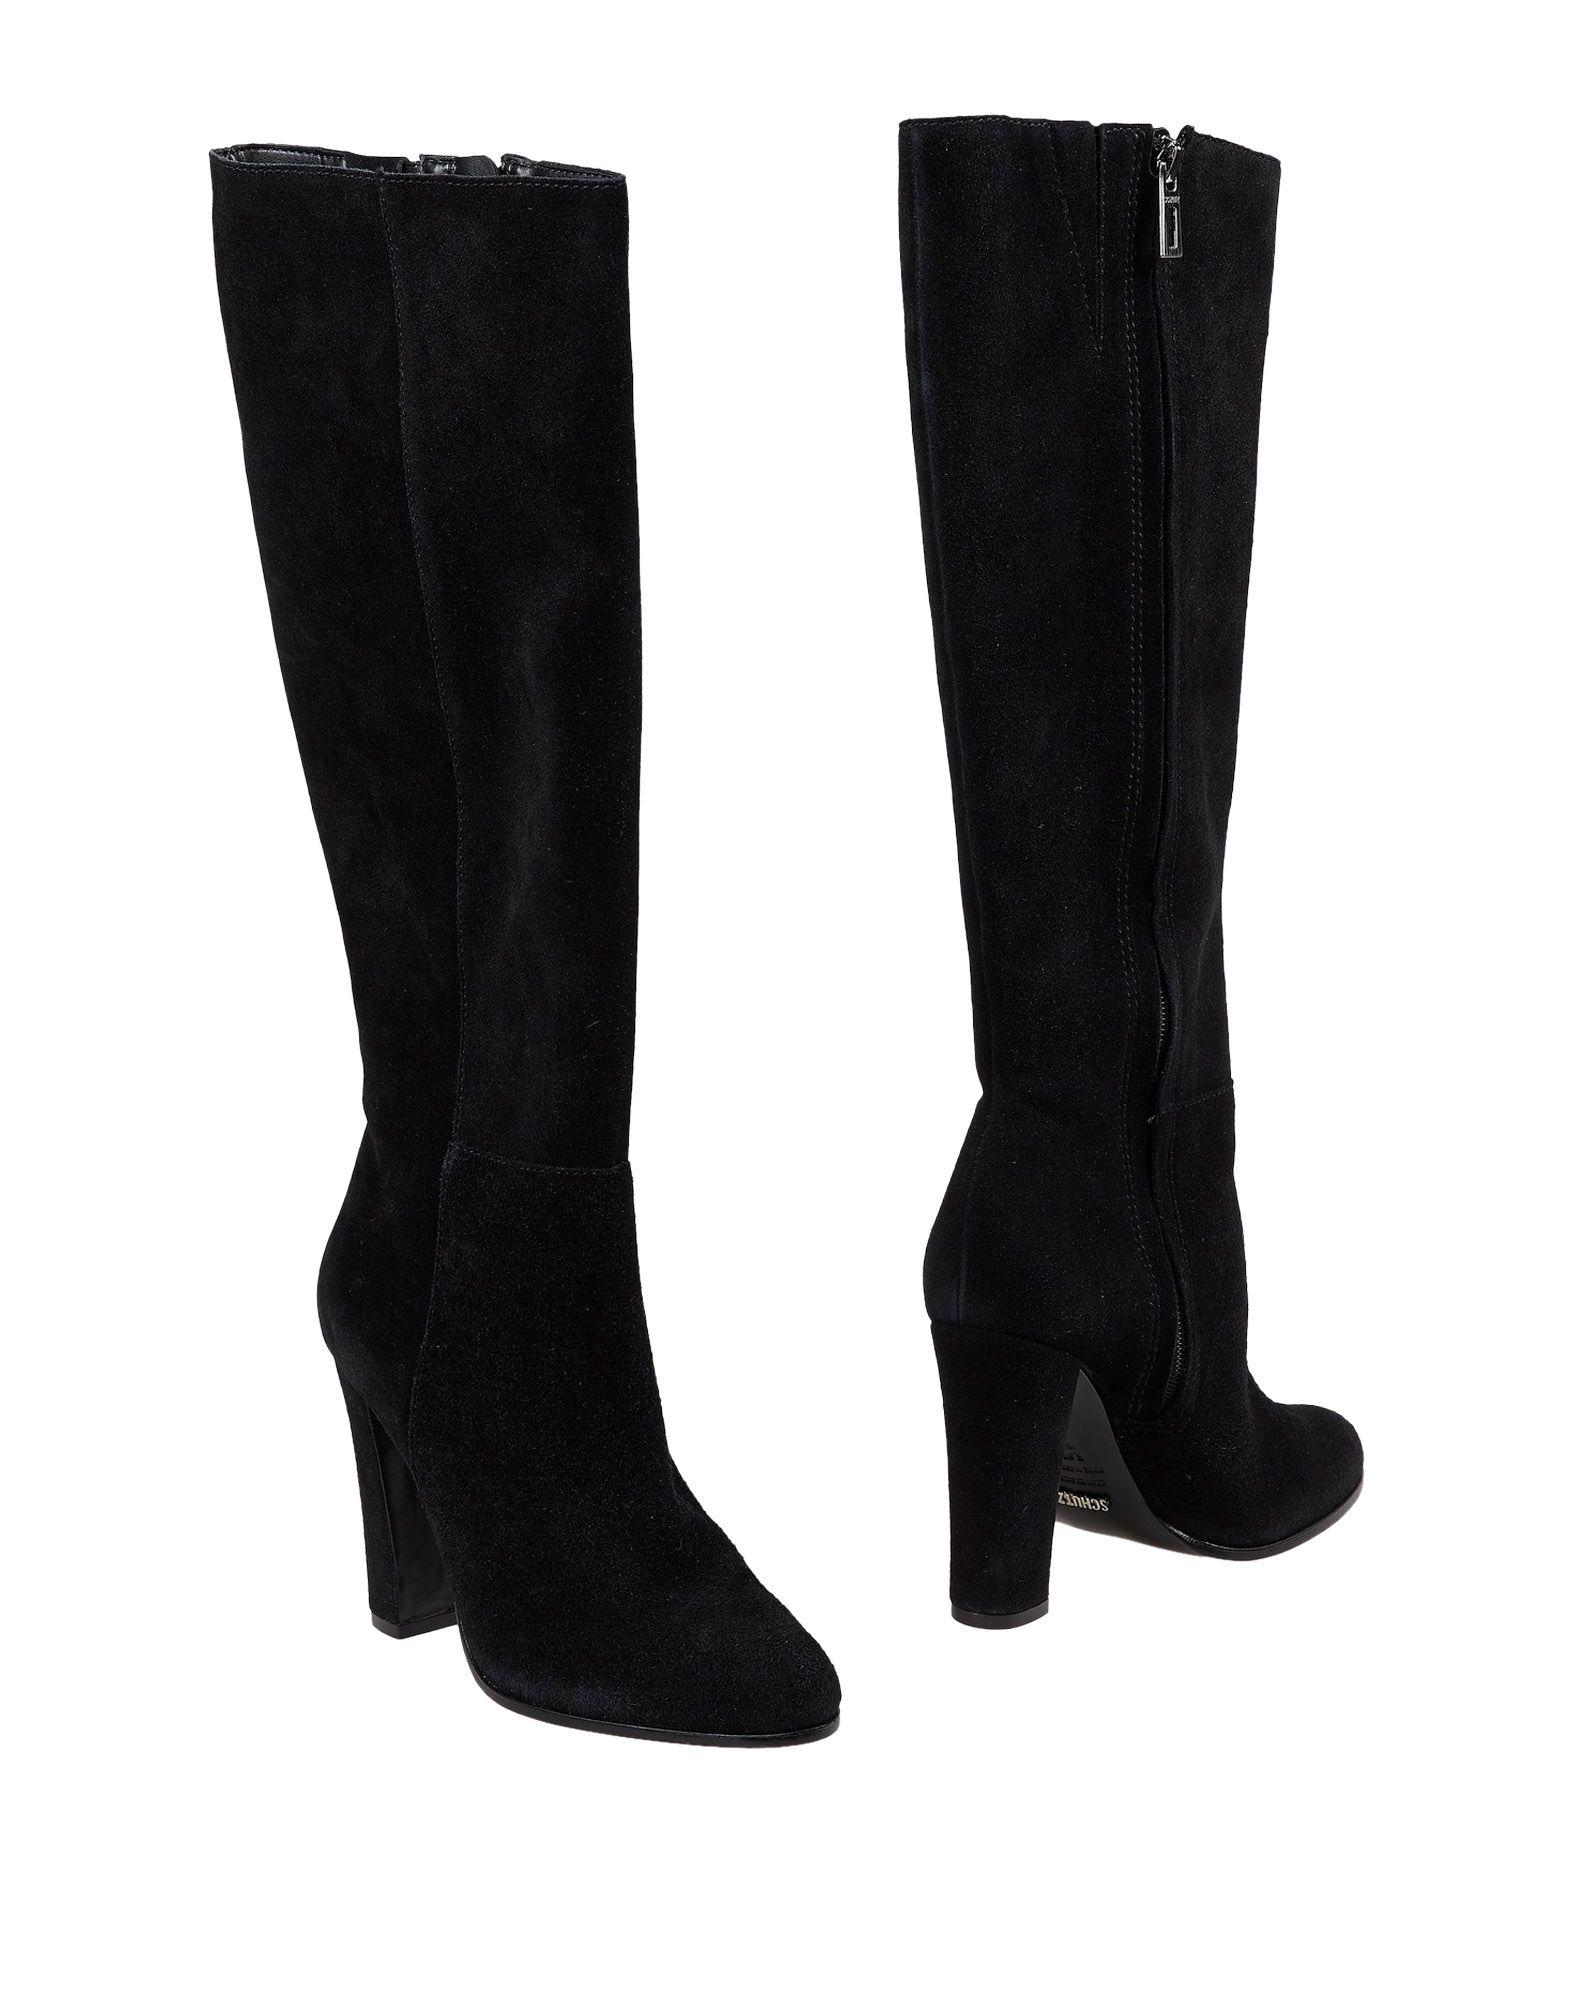 Schutz Boots online - Women Schutz Boots online Boots on  Canada - 11540742QV 3c33cc